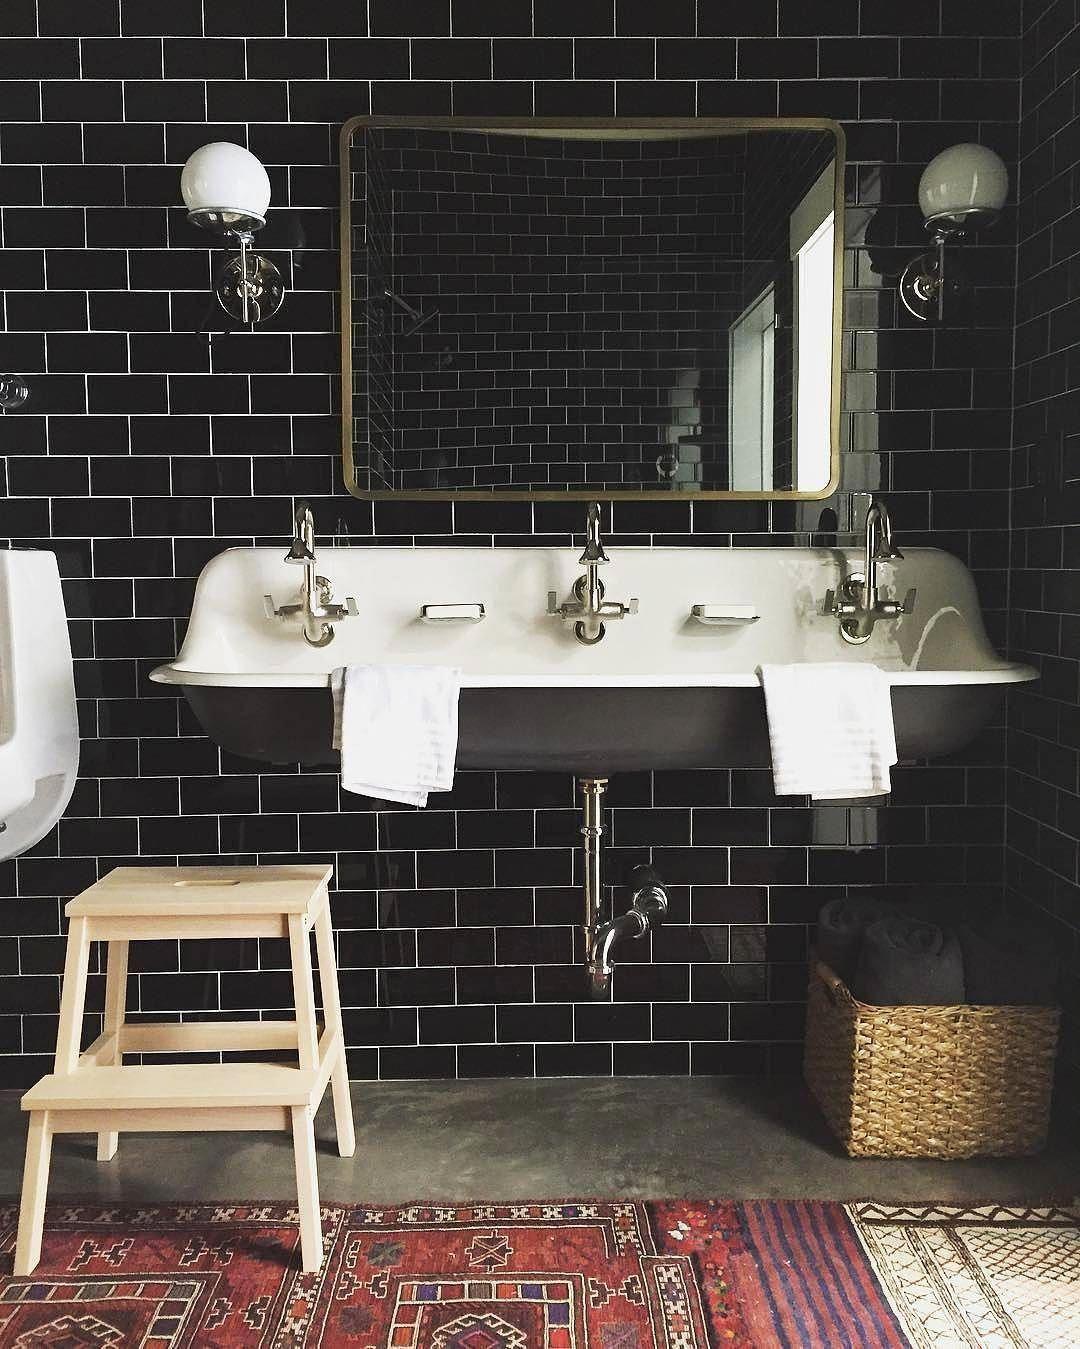 piastrelle in stile metropolitana bagno